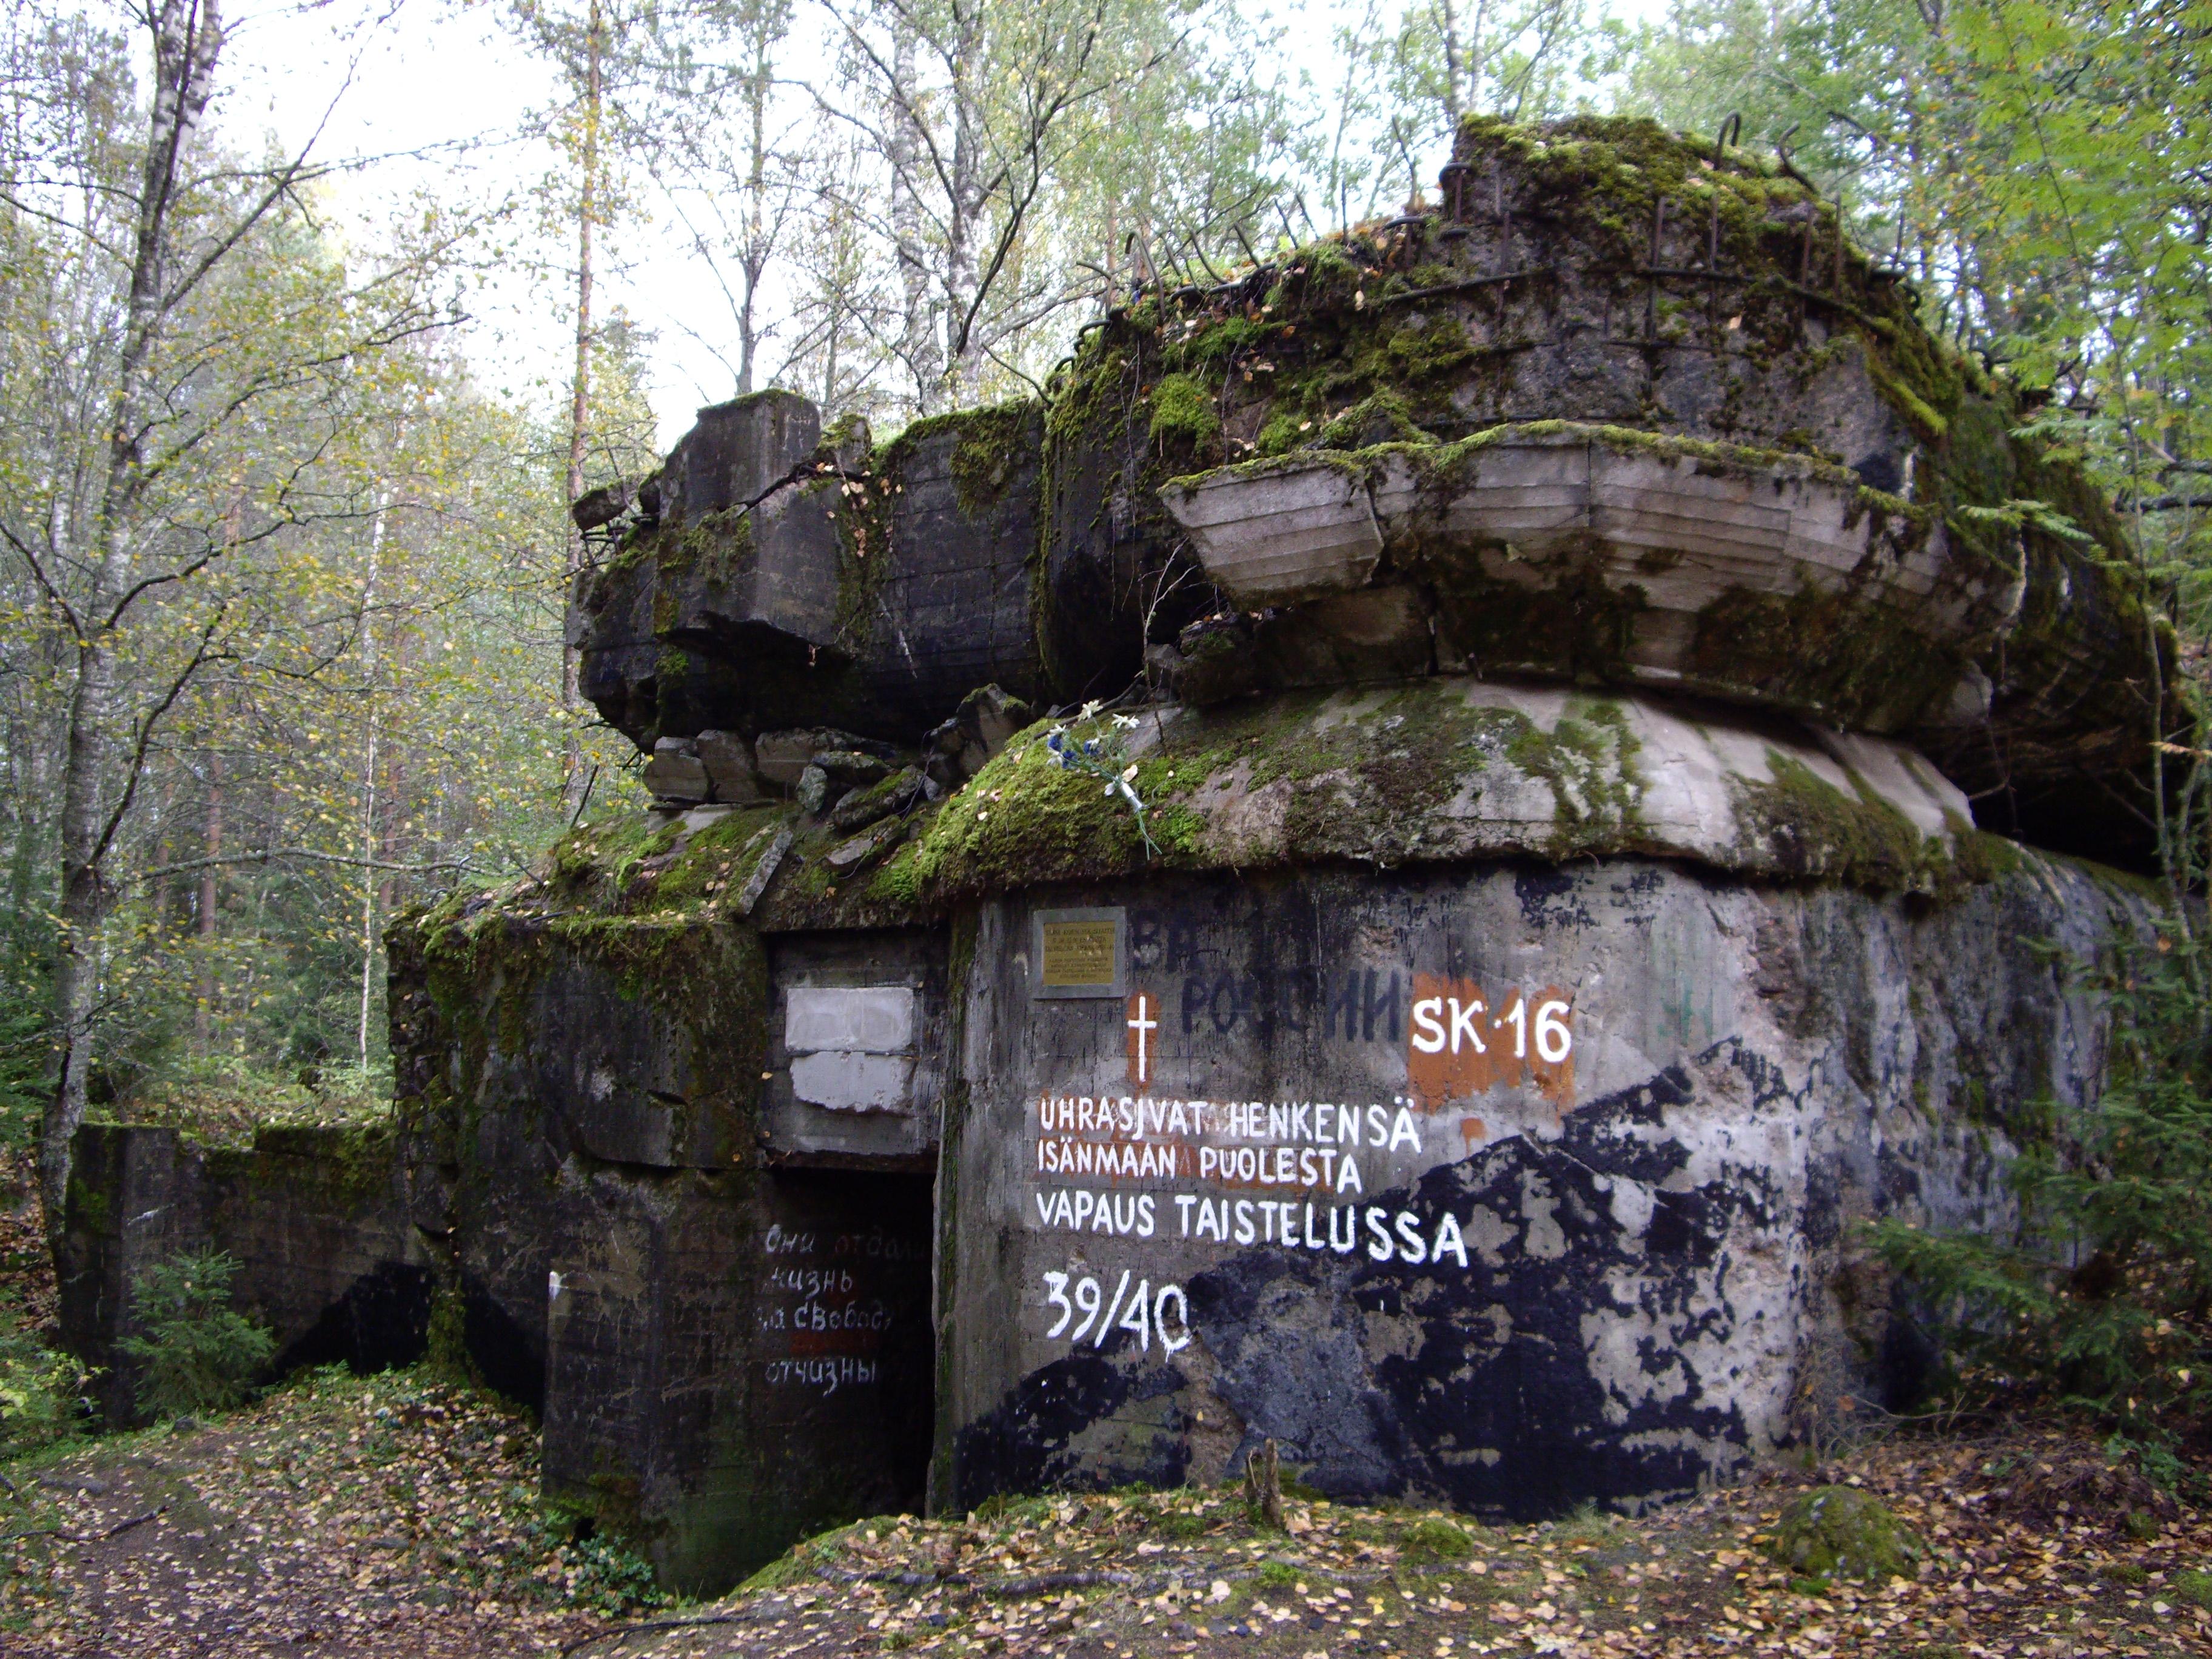 sk16_bunker_of_mannerheim_line.jpg